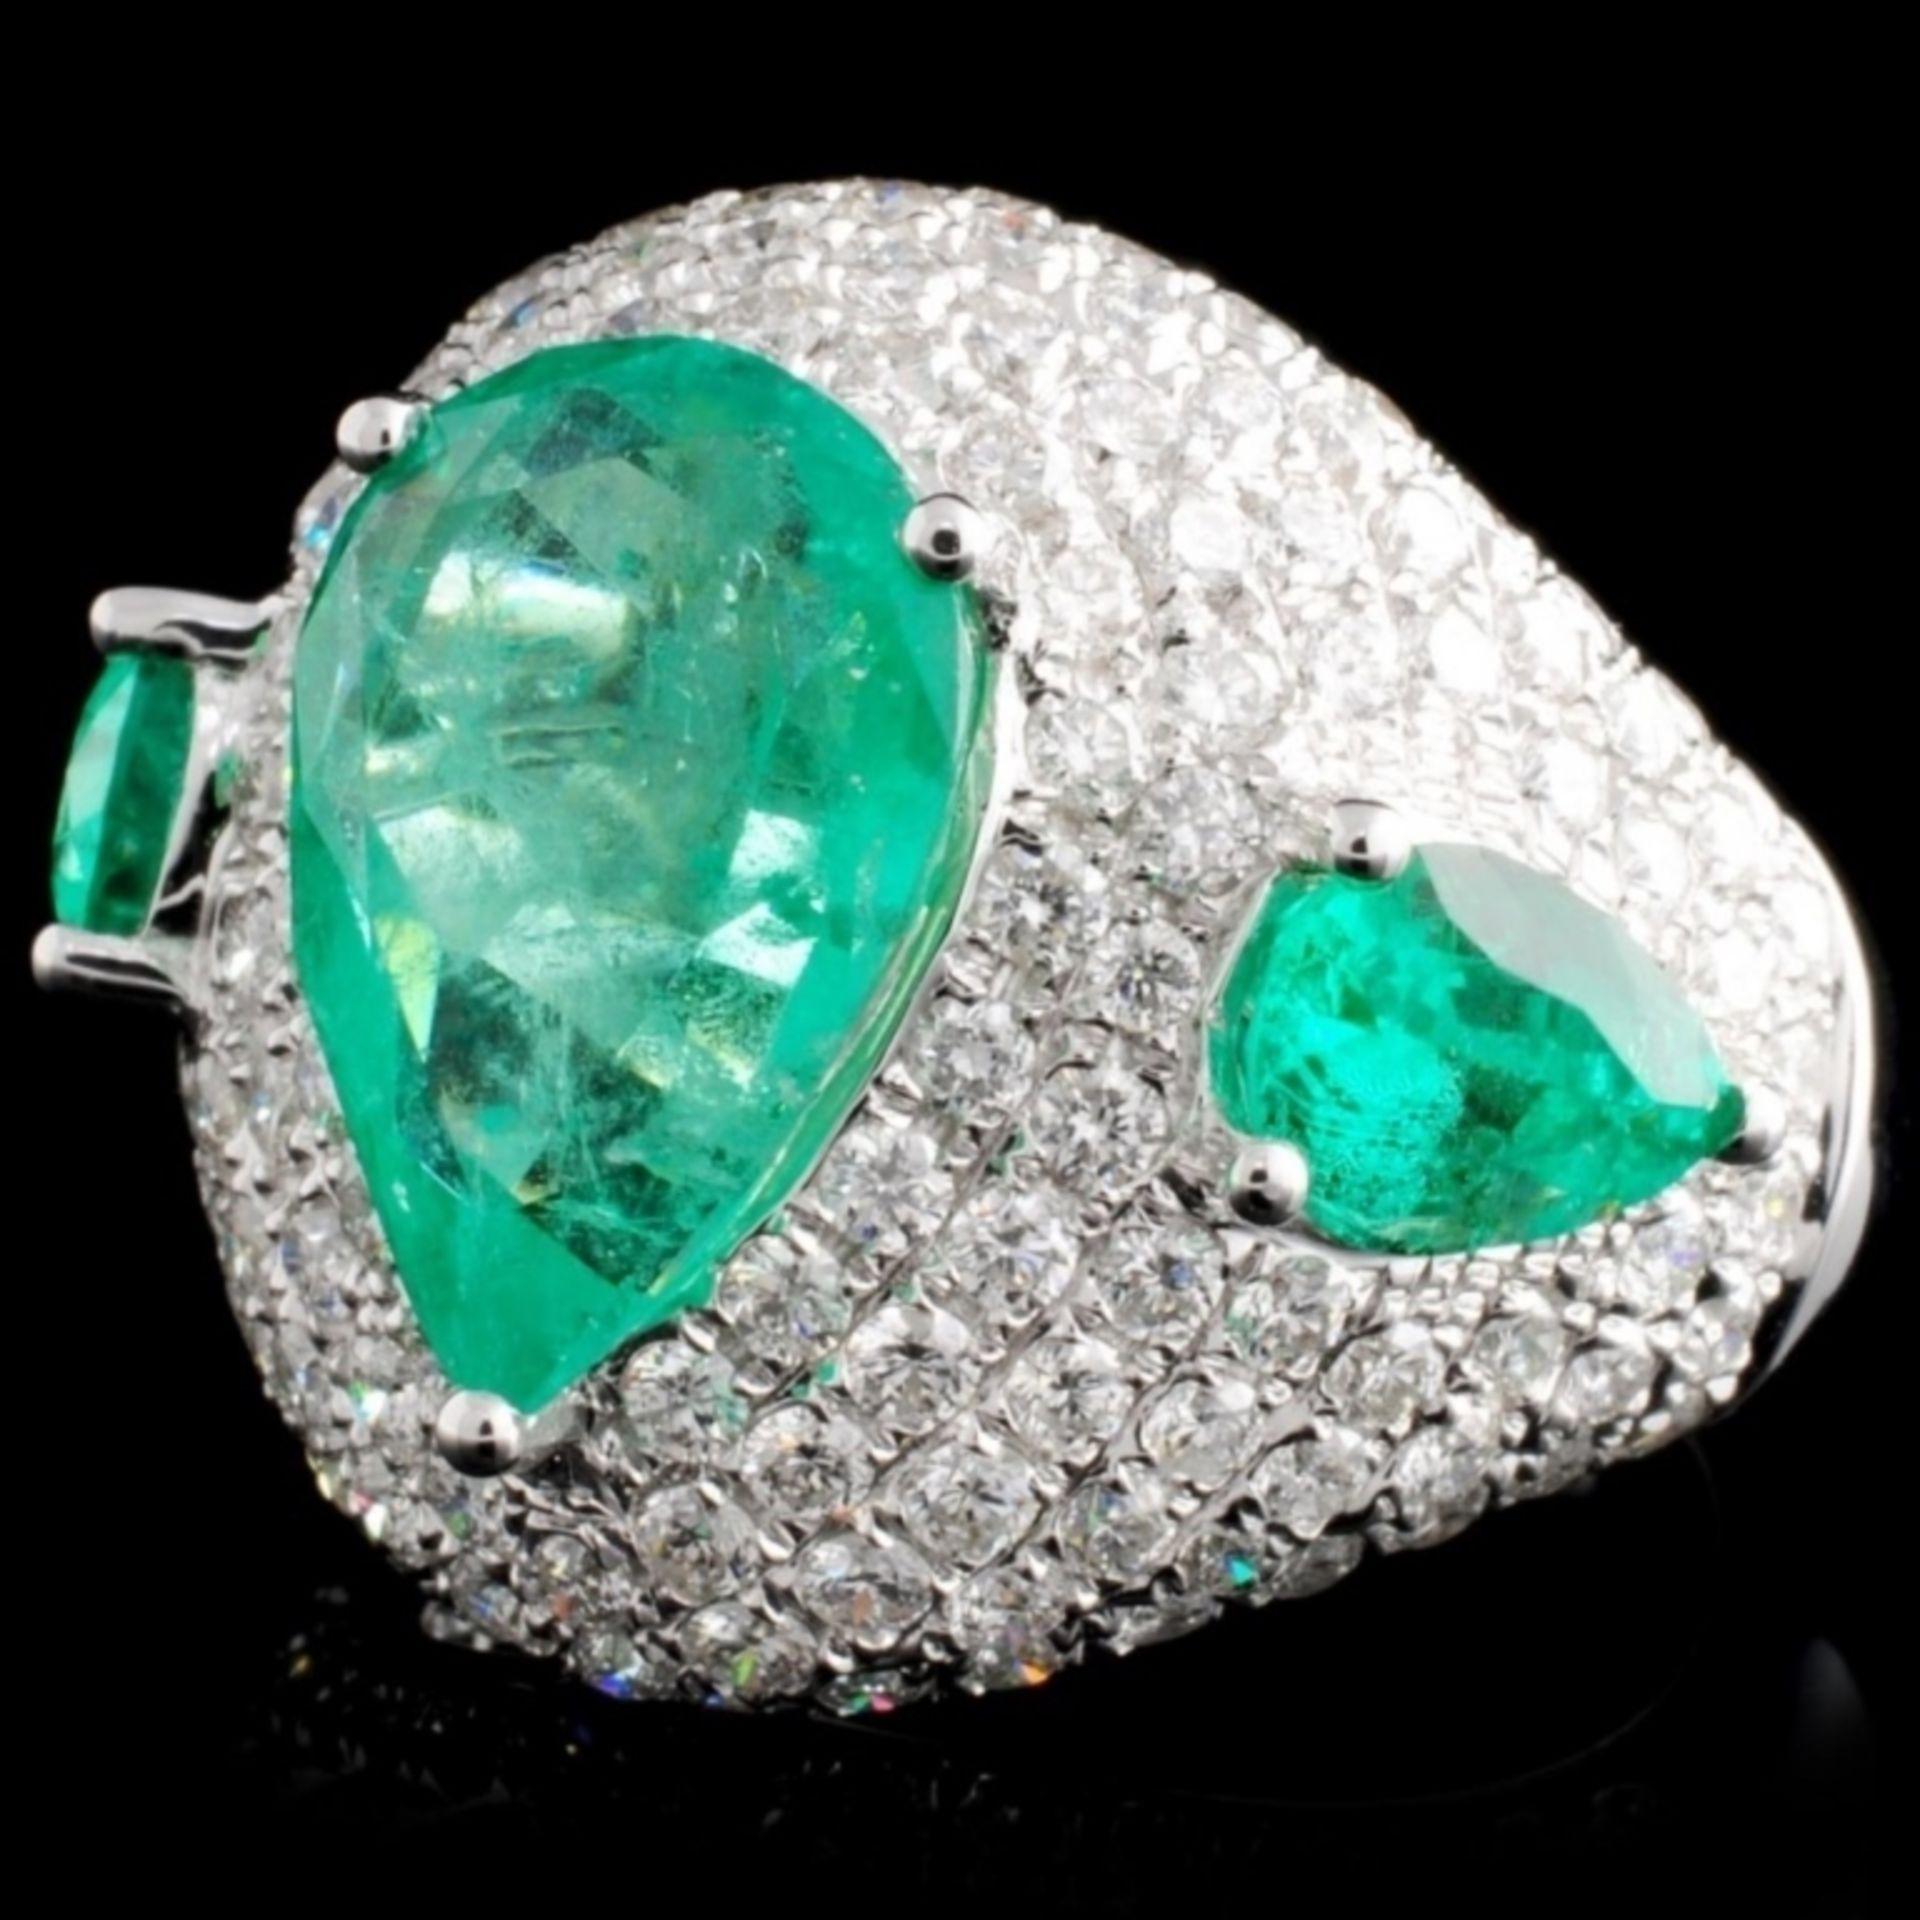 18K Gold 5.07ct Emerald & 2.52ct Diamond Ring - Image 2 of 4